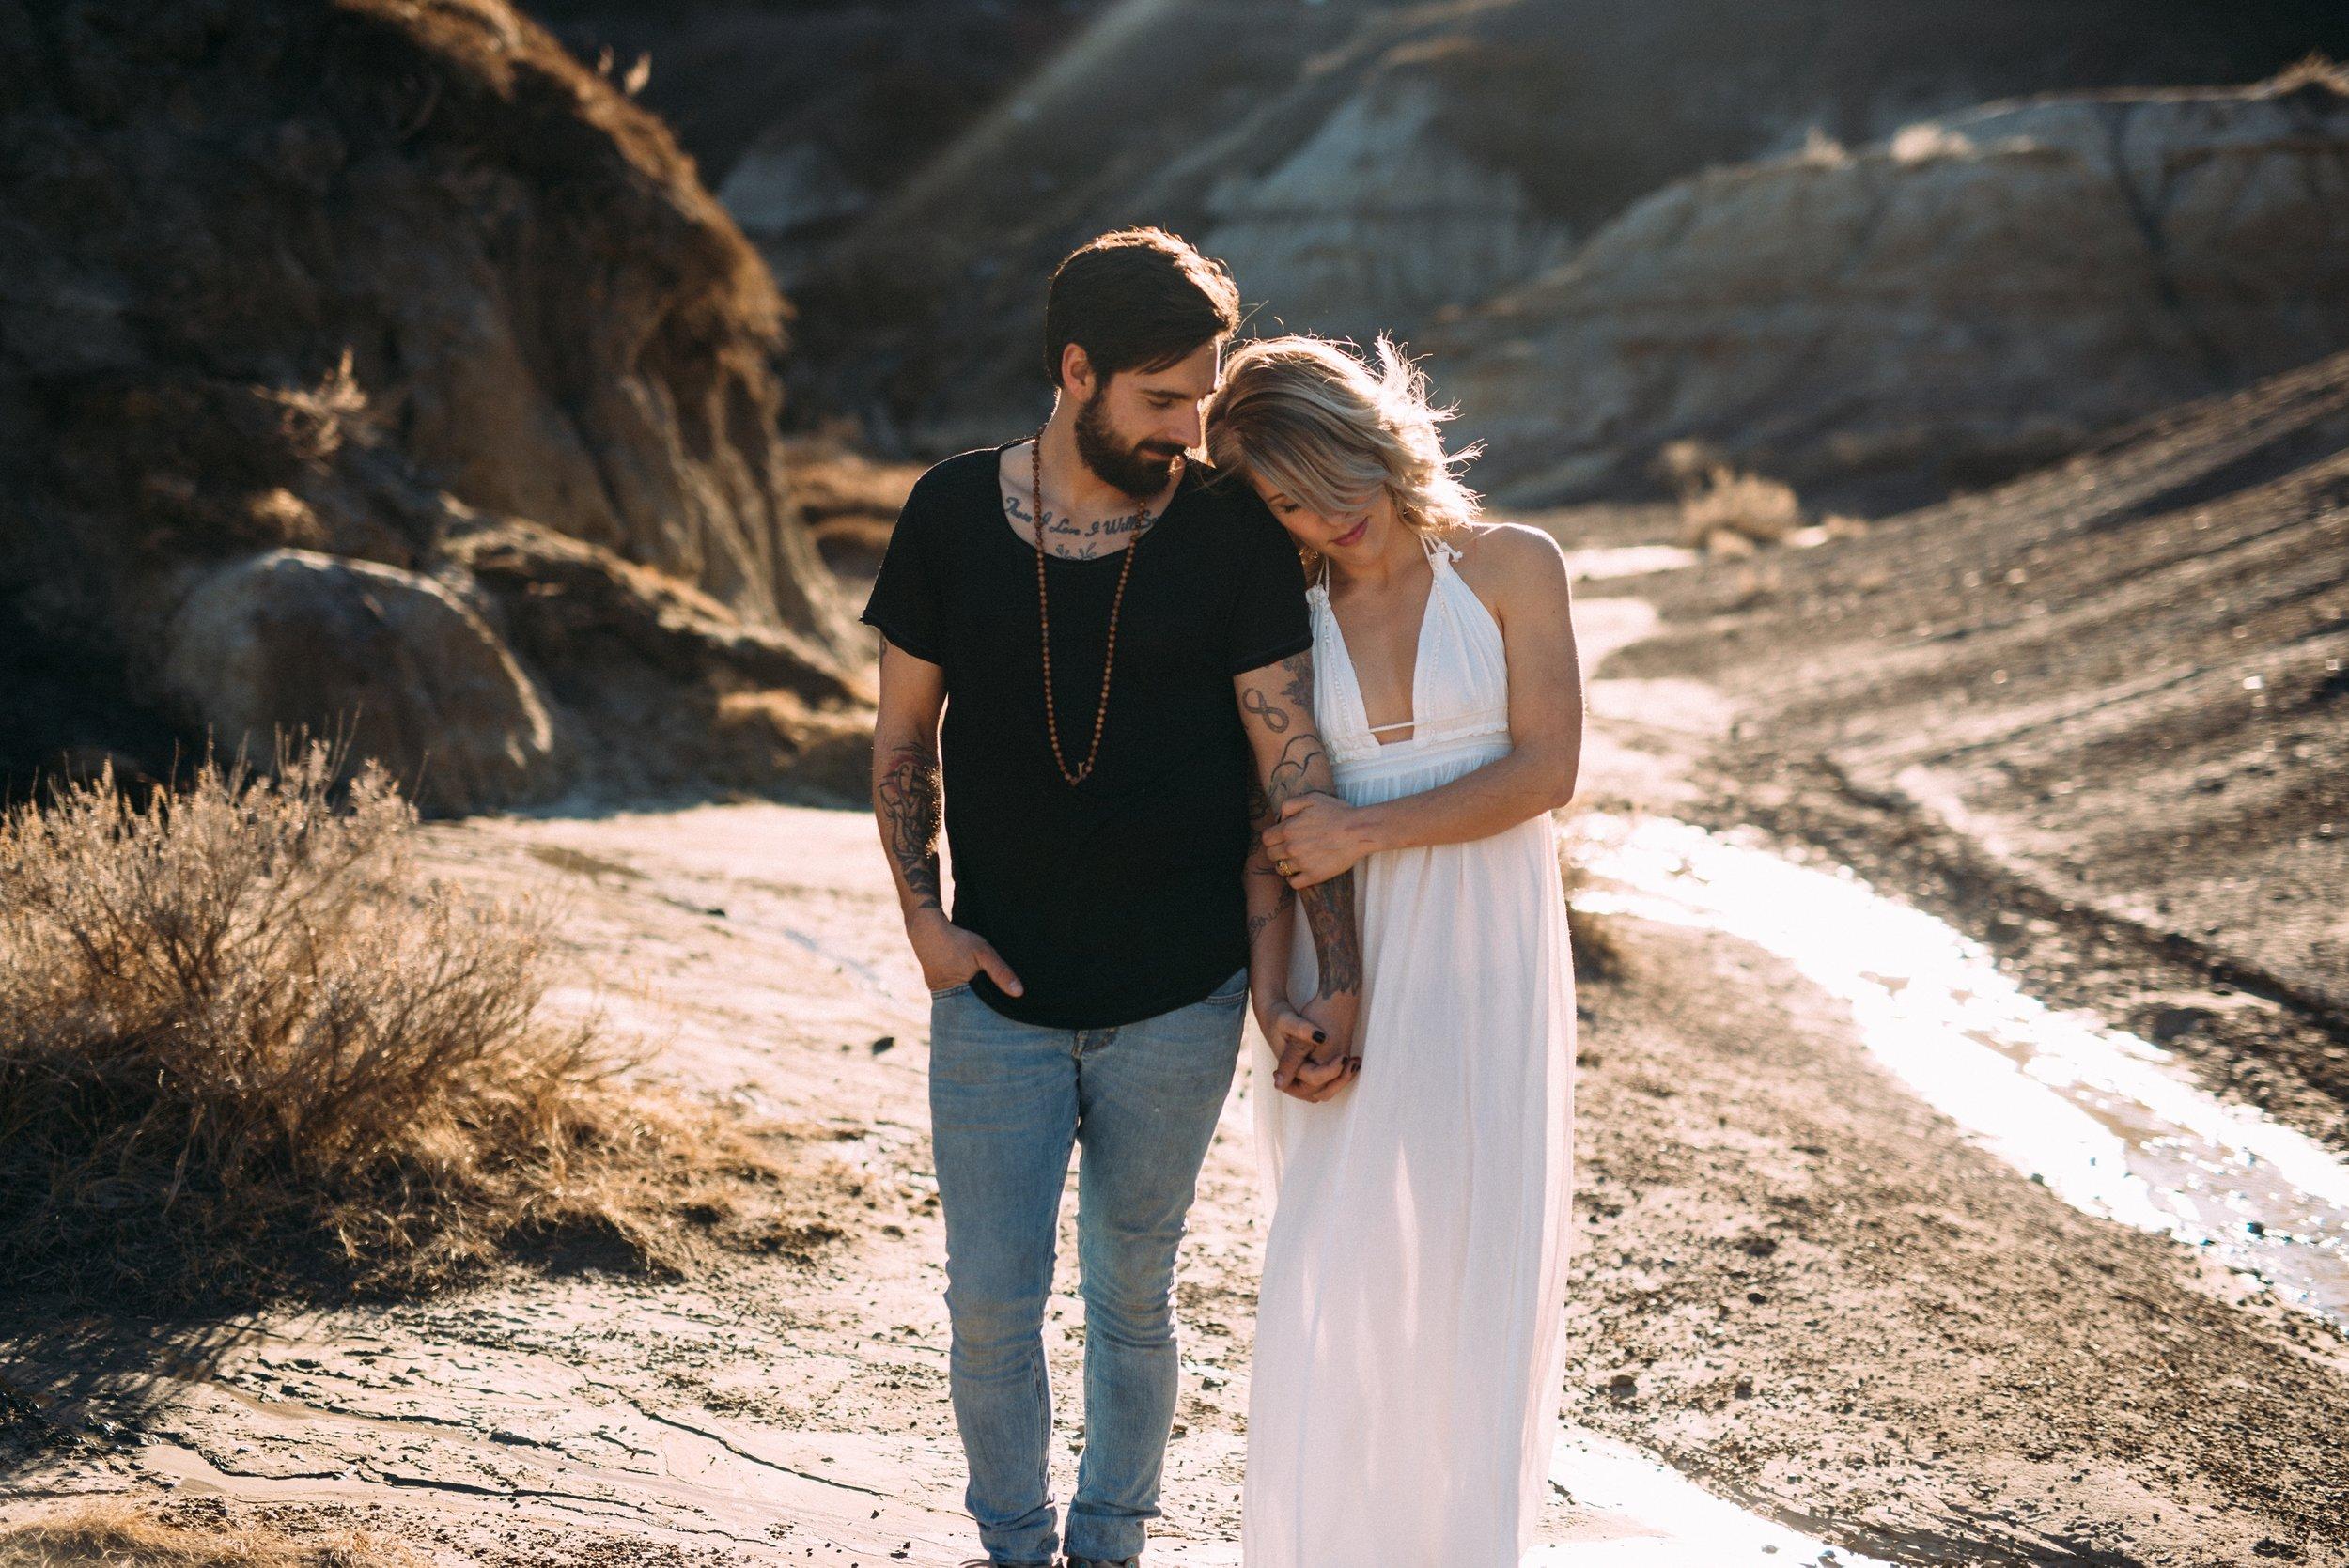 kaihla_tonai_intimate_wedding_elopement_photographer_3556